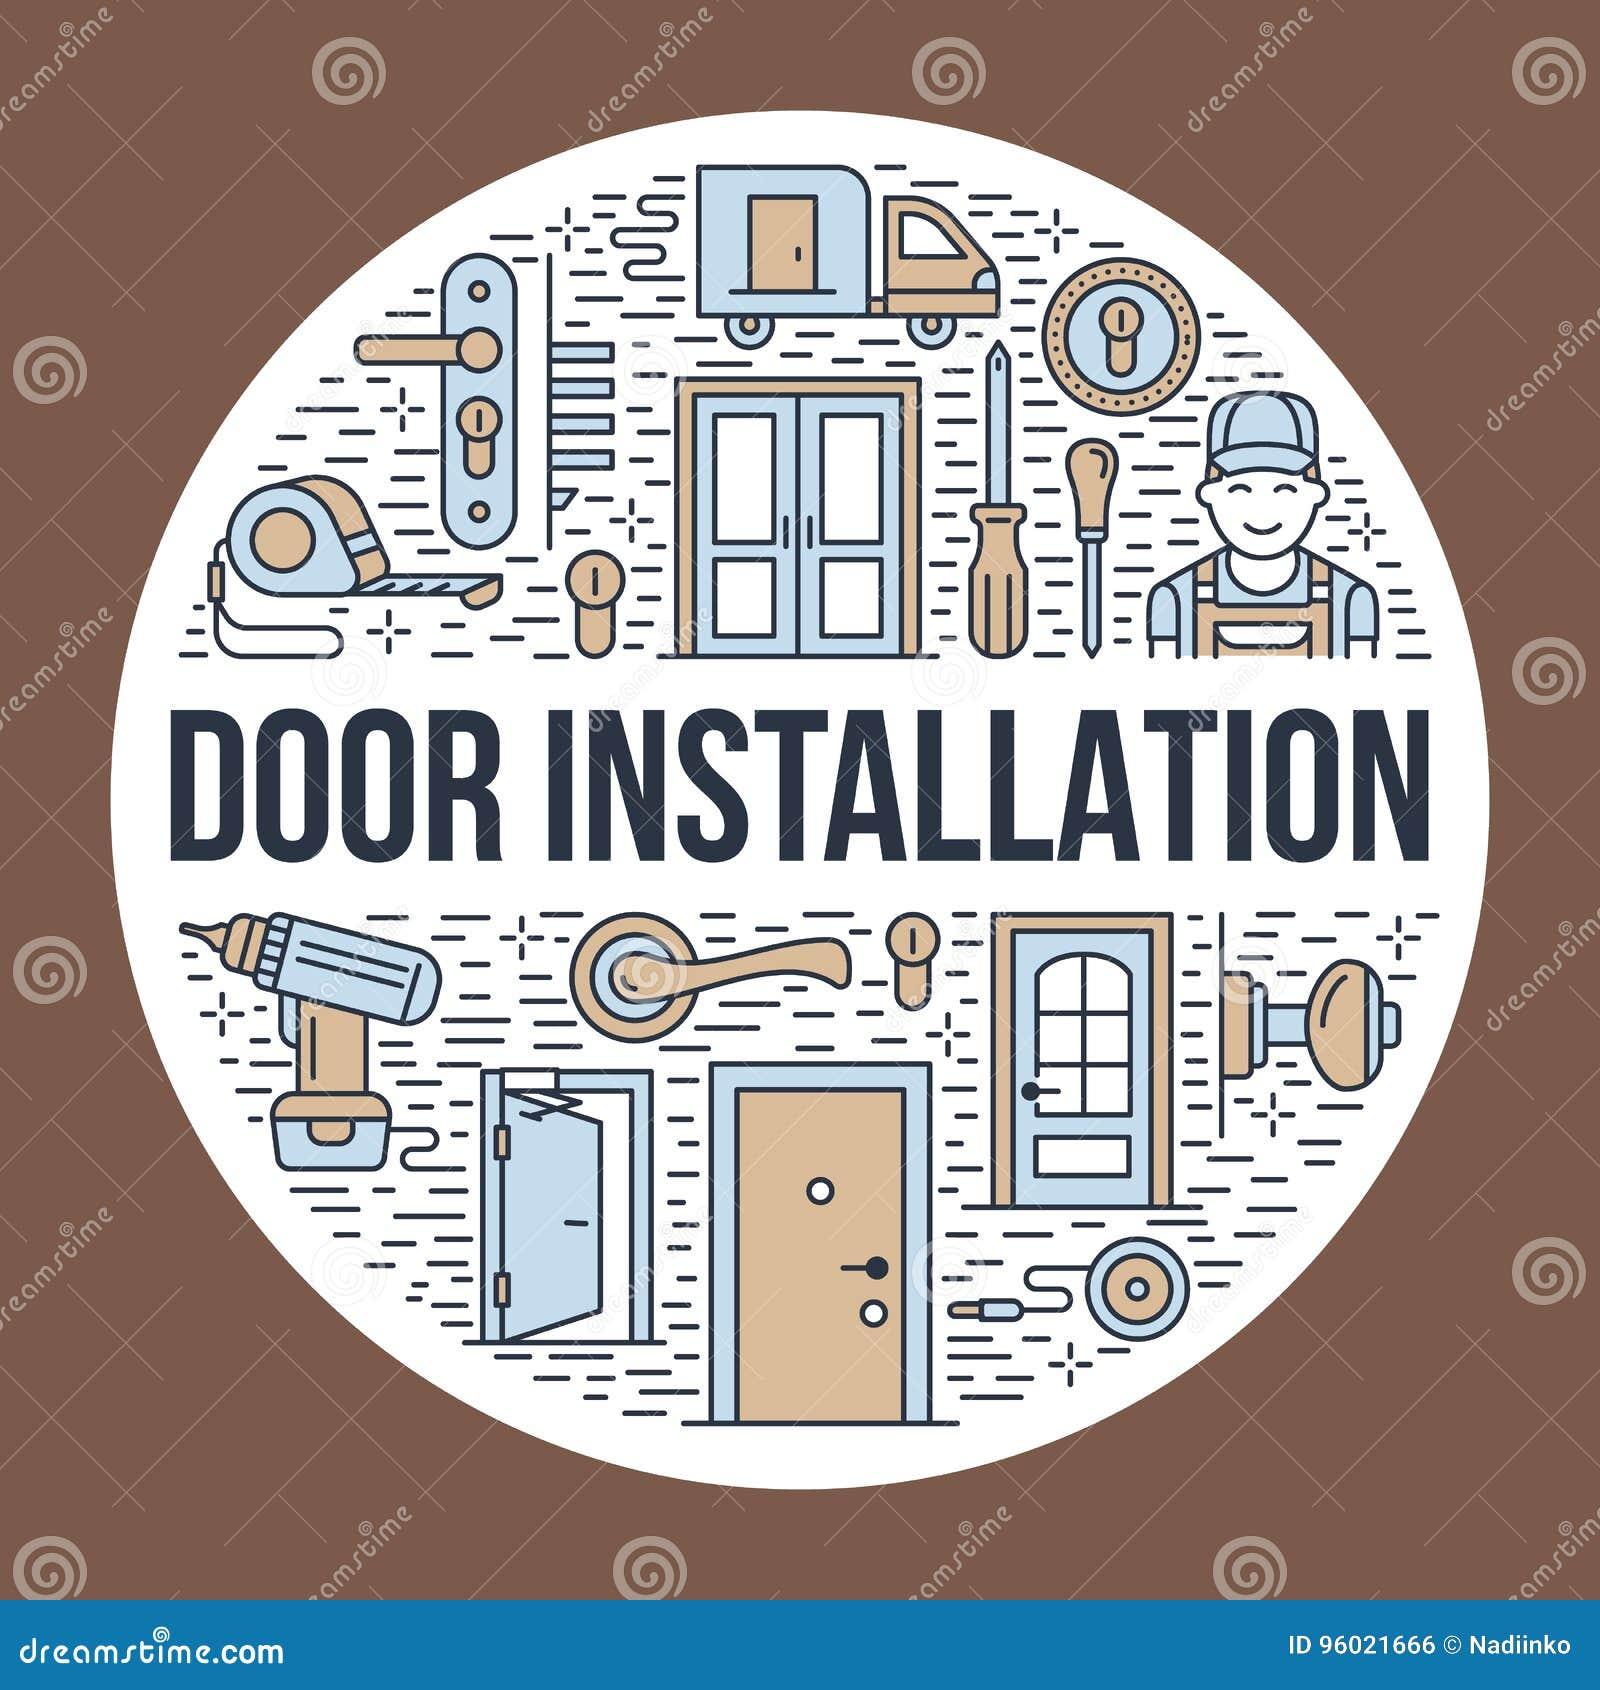 Doors Installation, Repair Banner Illustration. Vector Line Icons Of ...